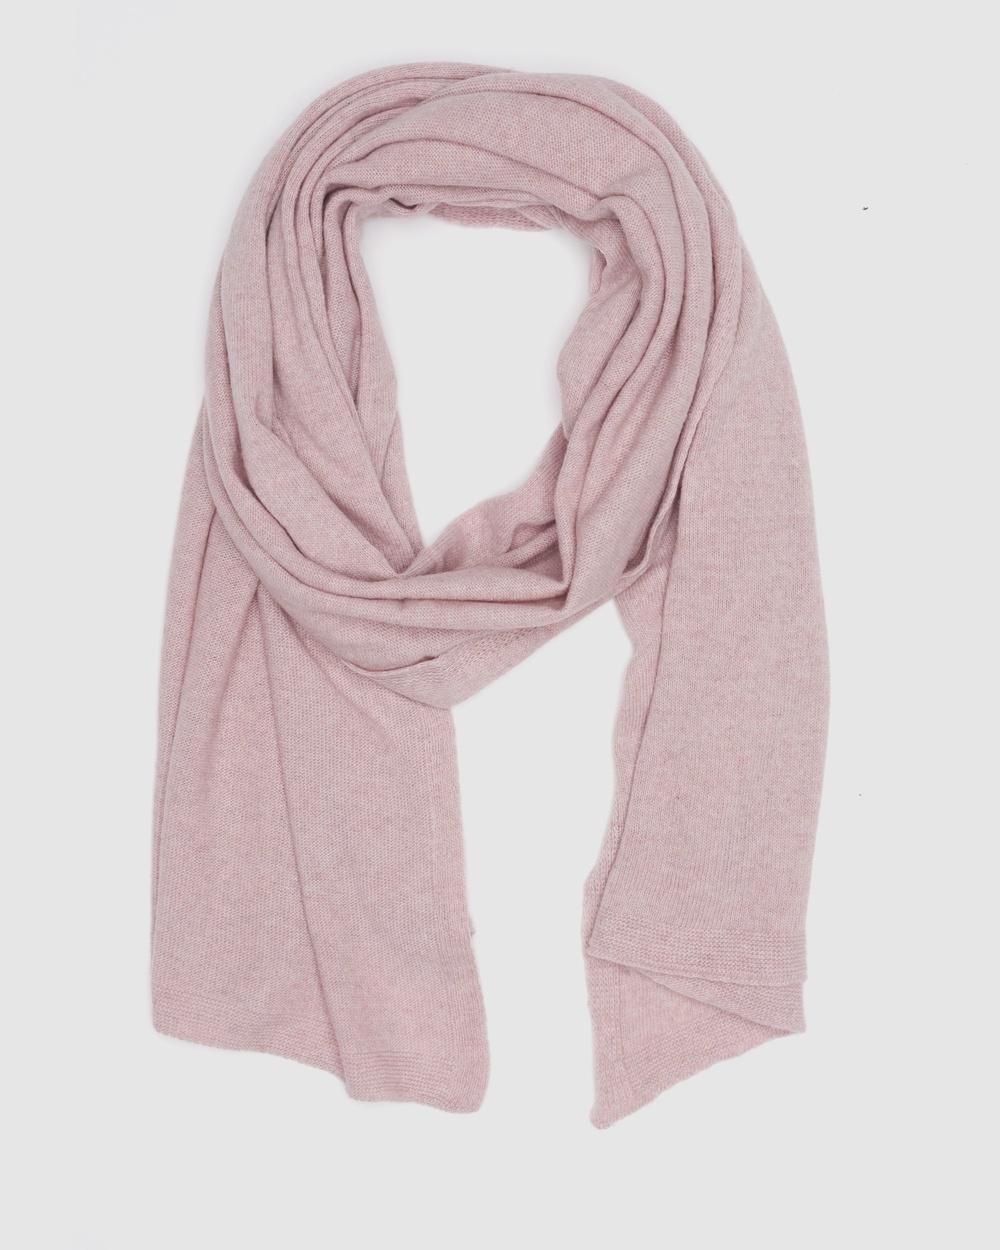 Kate & Confusion Cashmere Blend Scarf Scarves Gloves Pink